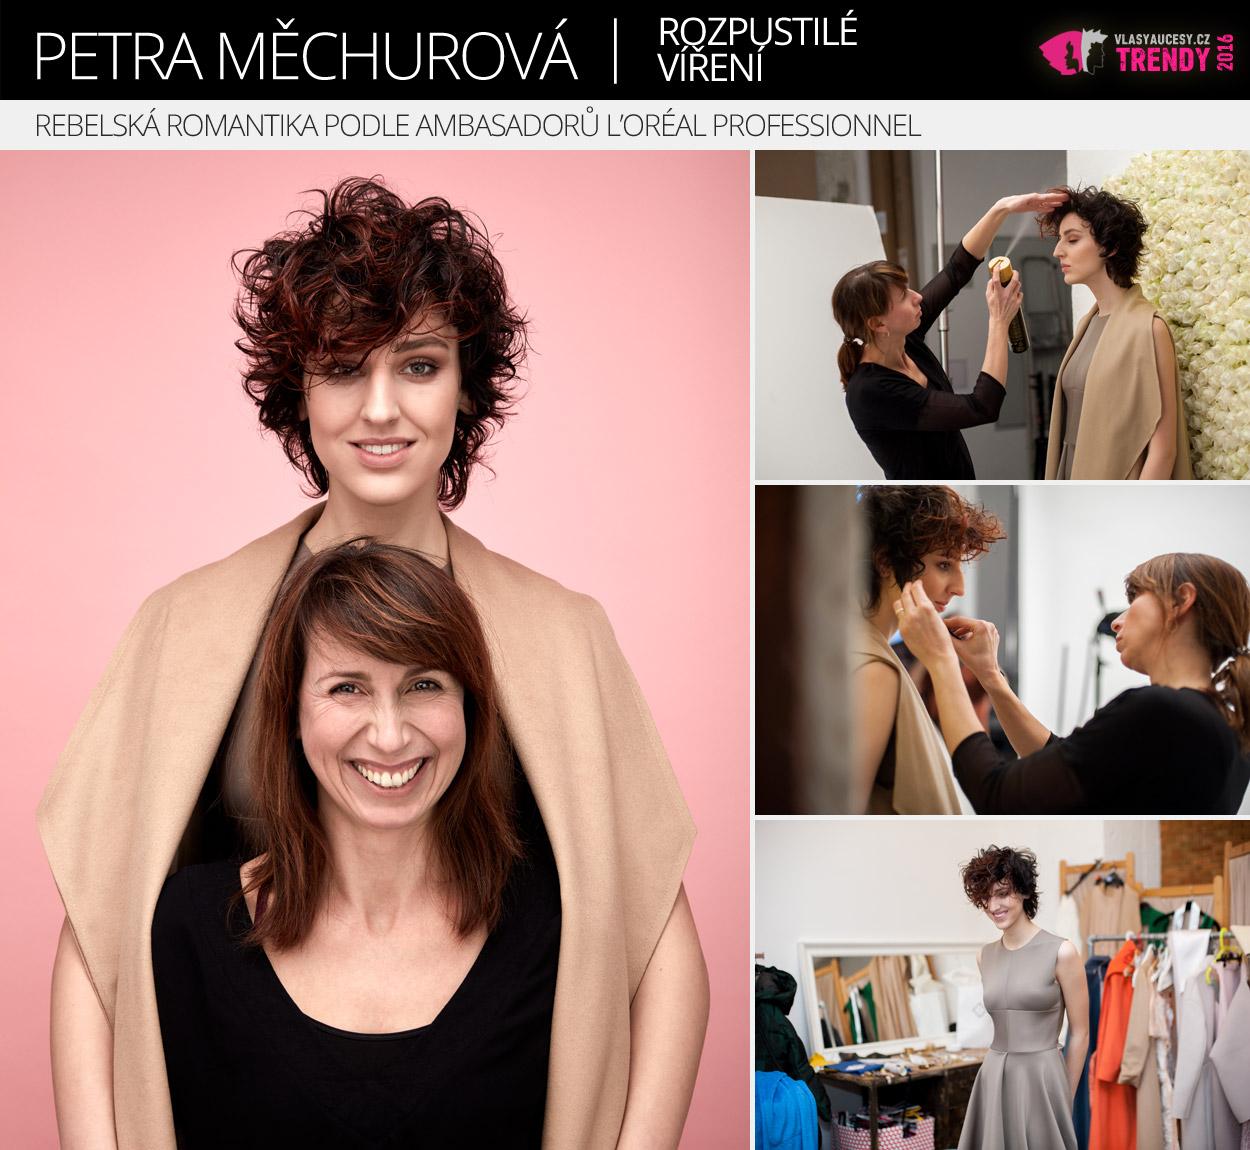 Ambasador L'Oréal Professionnel: Petra Měchurová